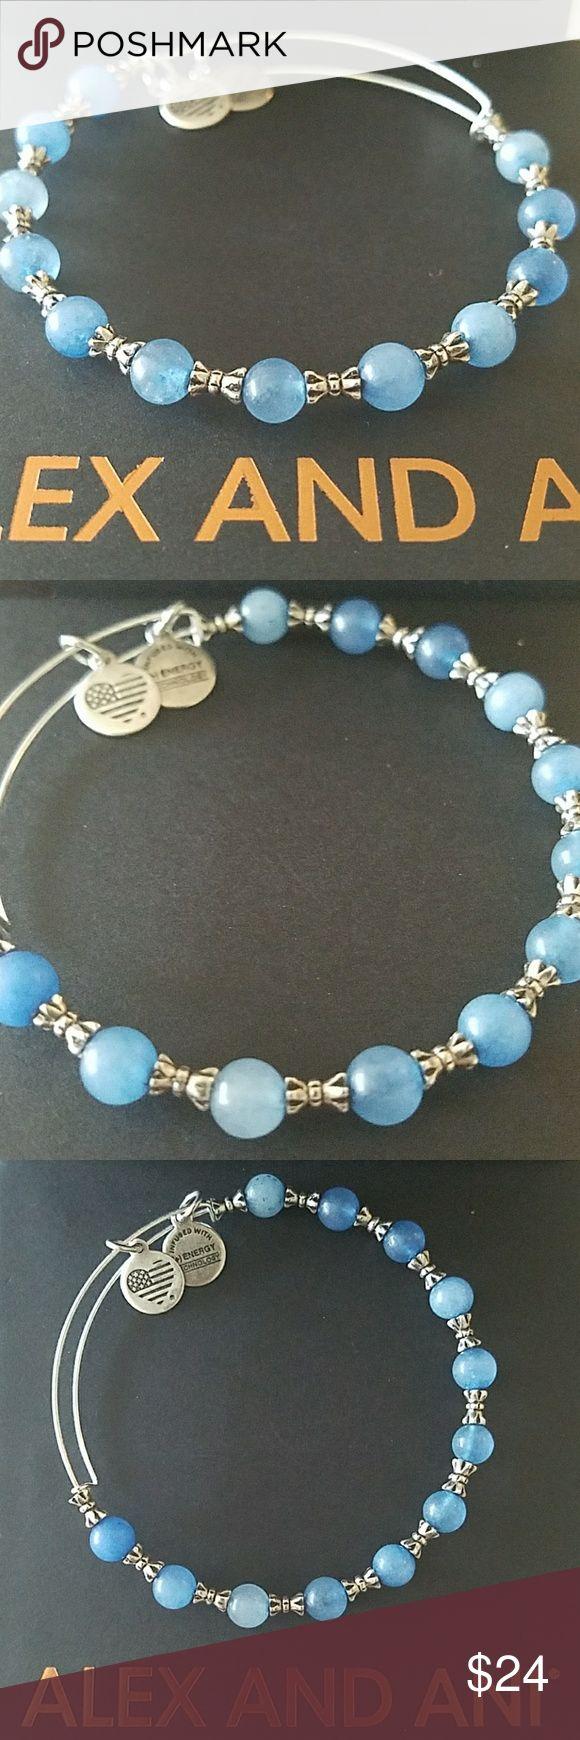 1 DAY SALE NWOT Alex & Ani Bracelet Alex and Ani Deep Sea Collection. Navy Harbor. Bundle and save. Use offer button to negotiate. Alex & Ani Jewelry Bracelets